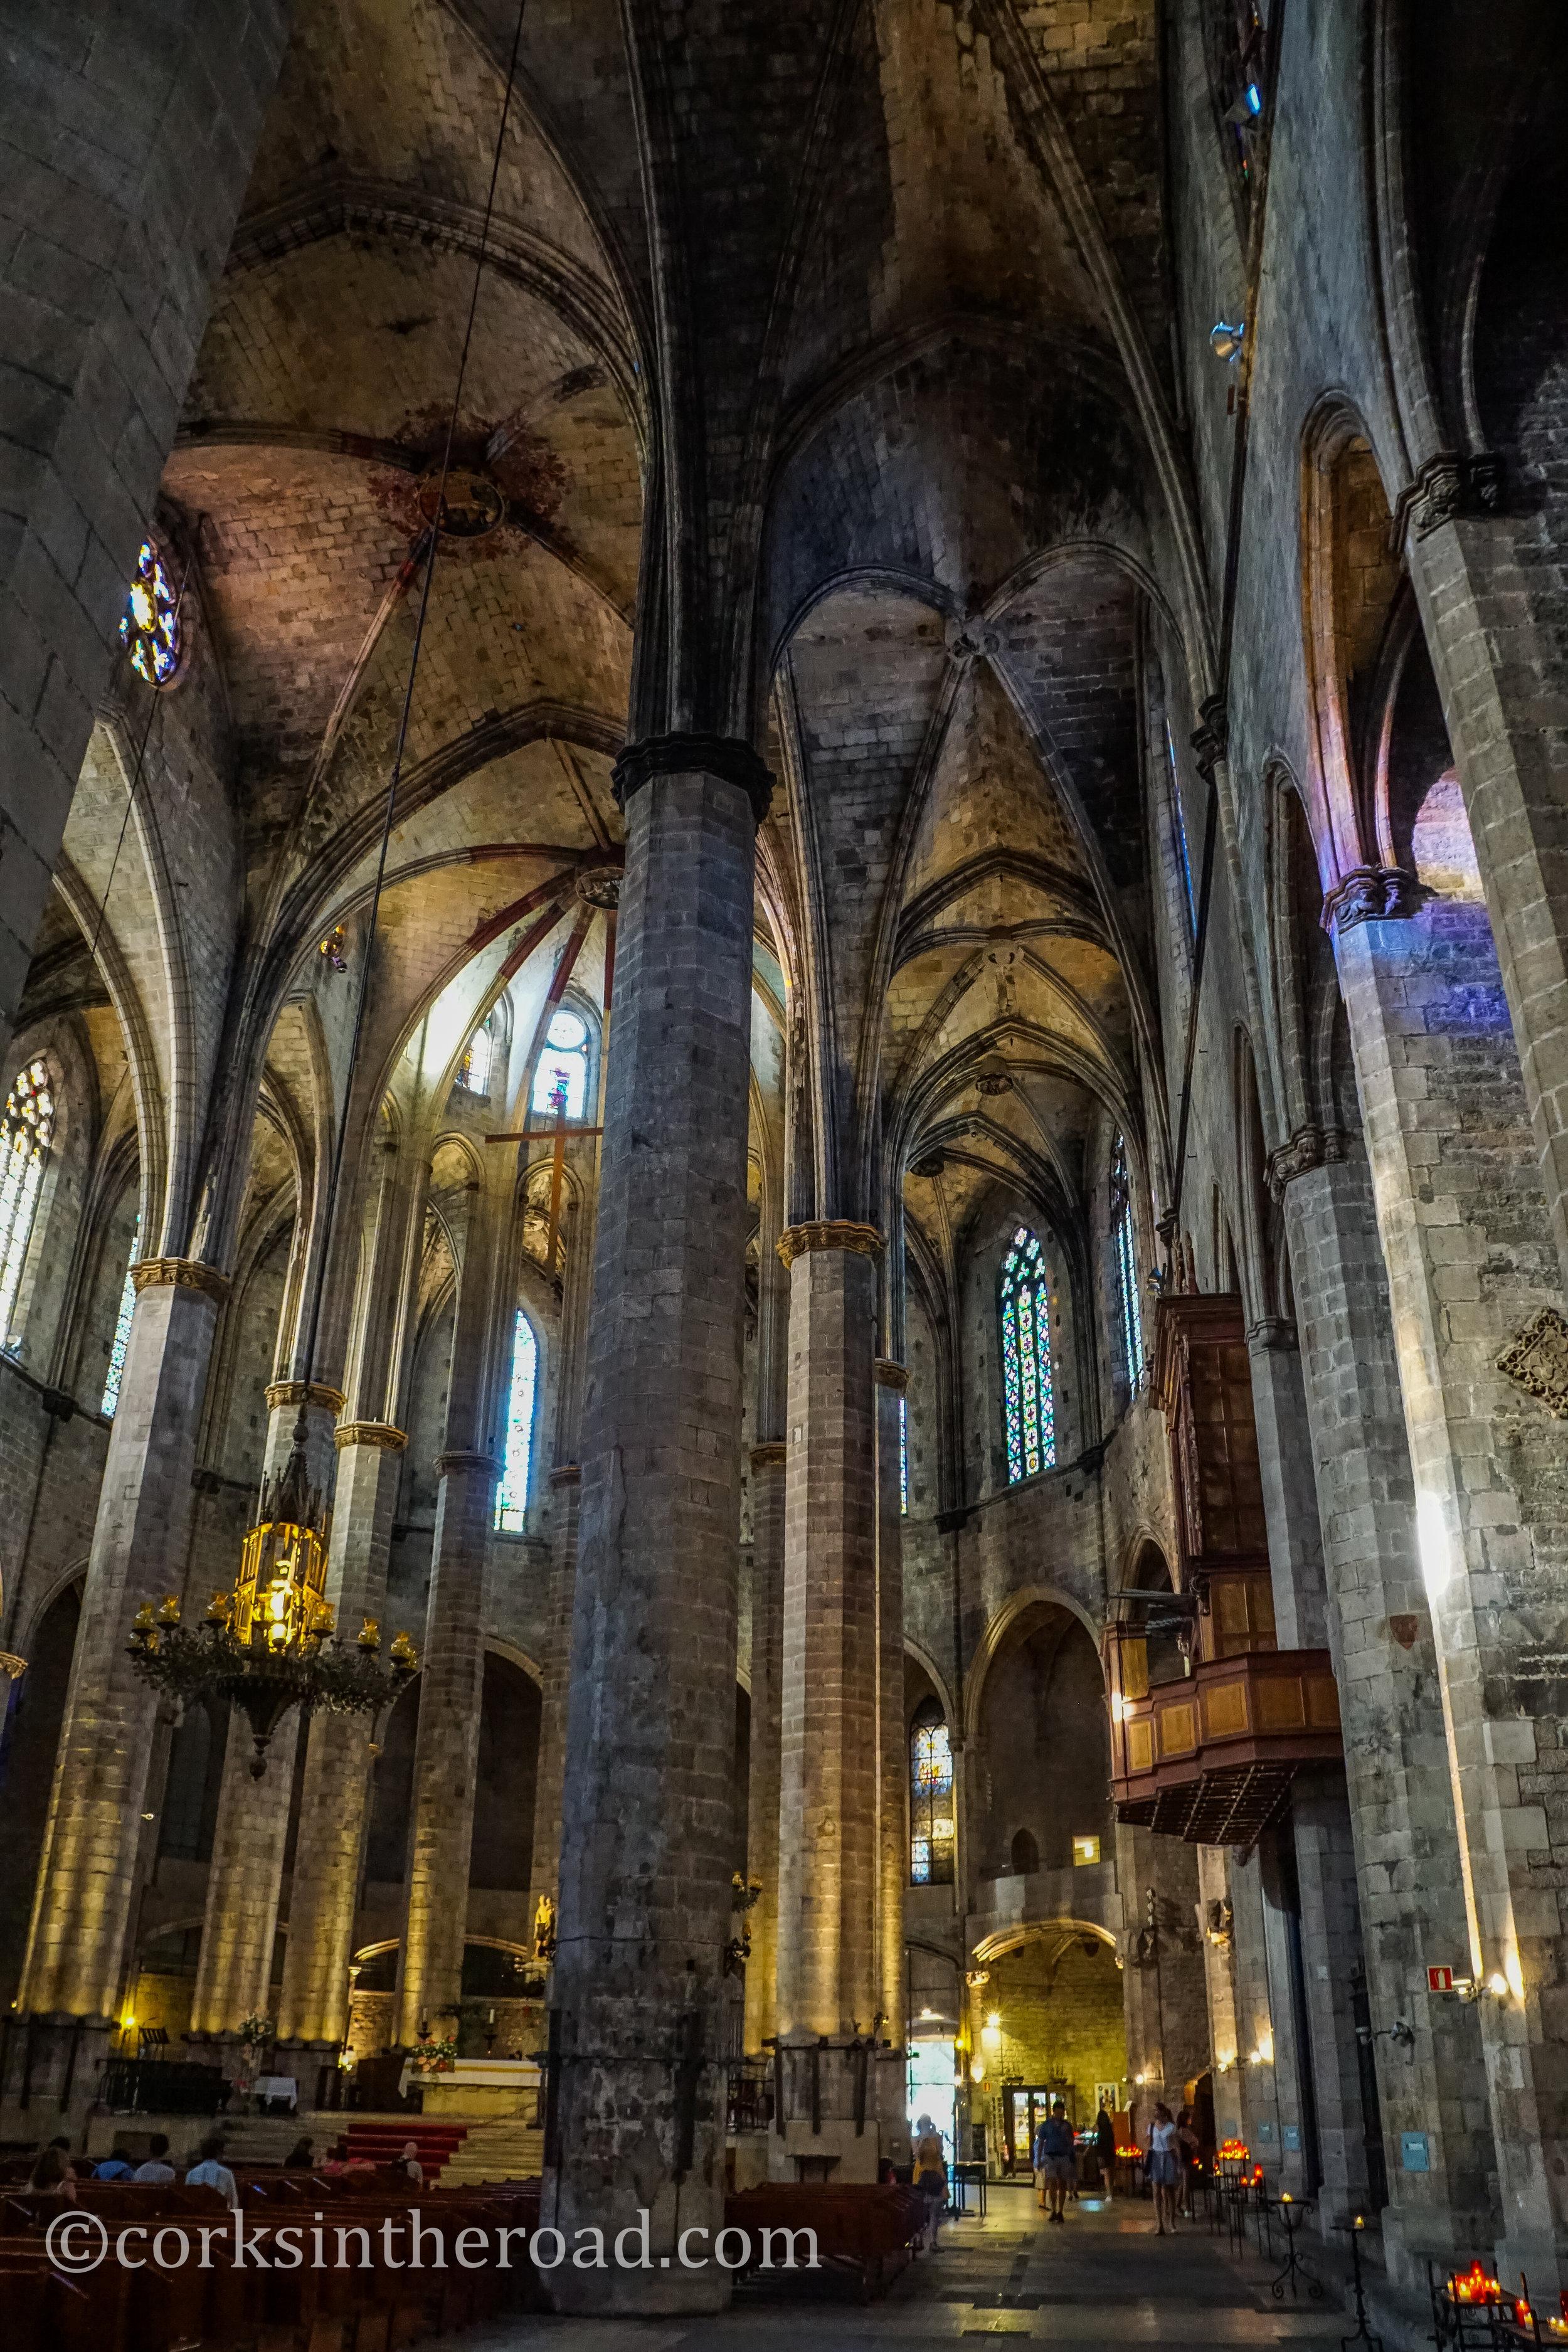 20160812Architecture, Barcelona, Churches, Corksintheroad-4.jpg